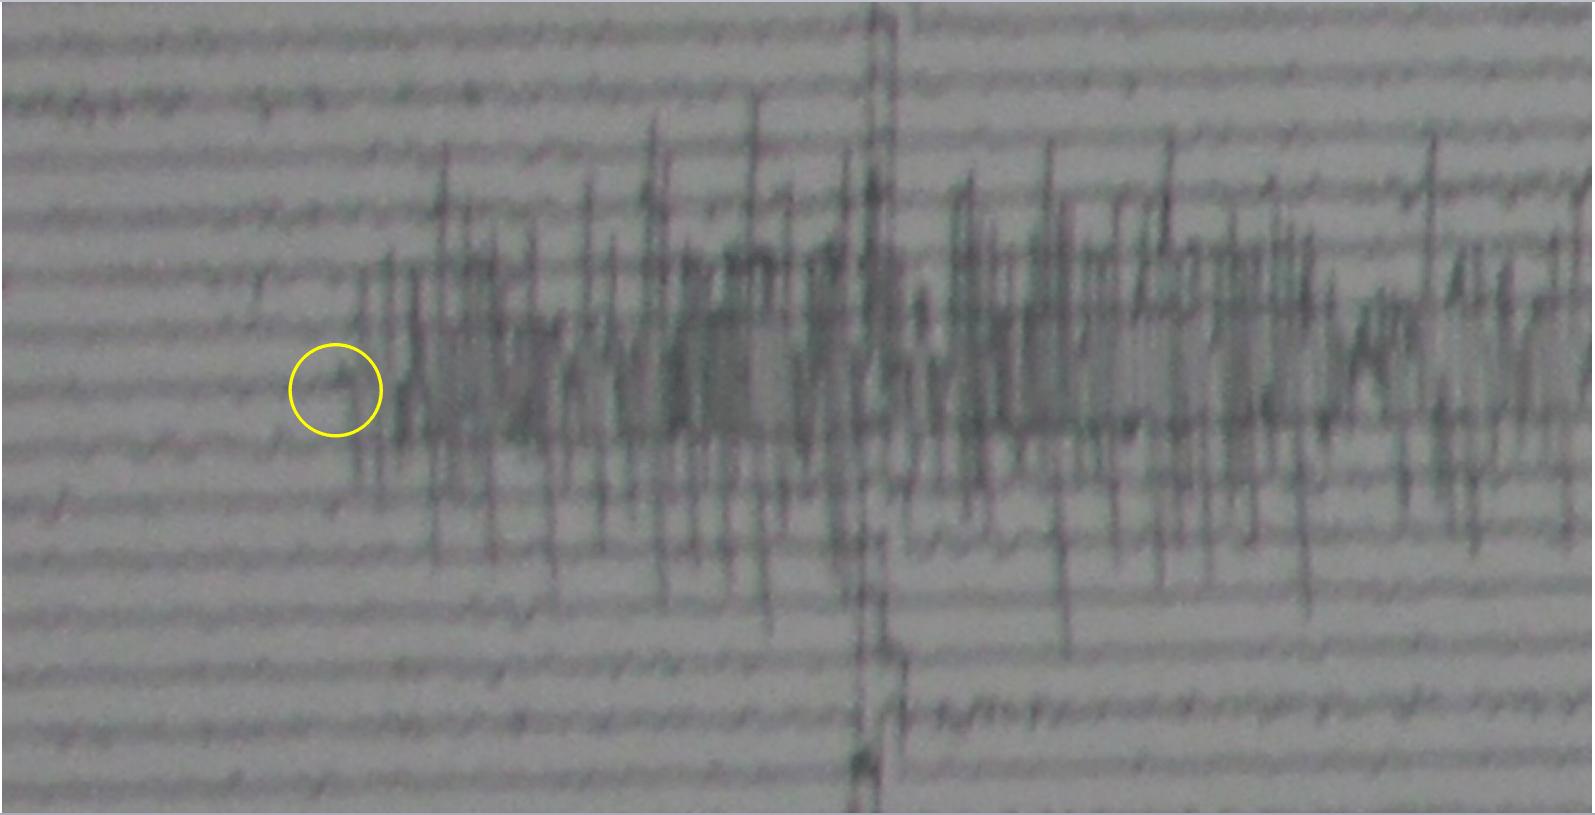 Earthquake Seismograph Analog as Earthquake Instrumentation